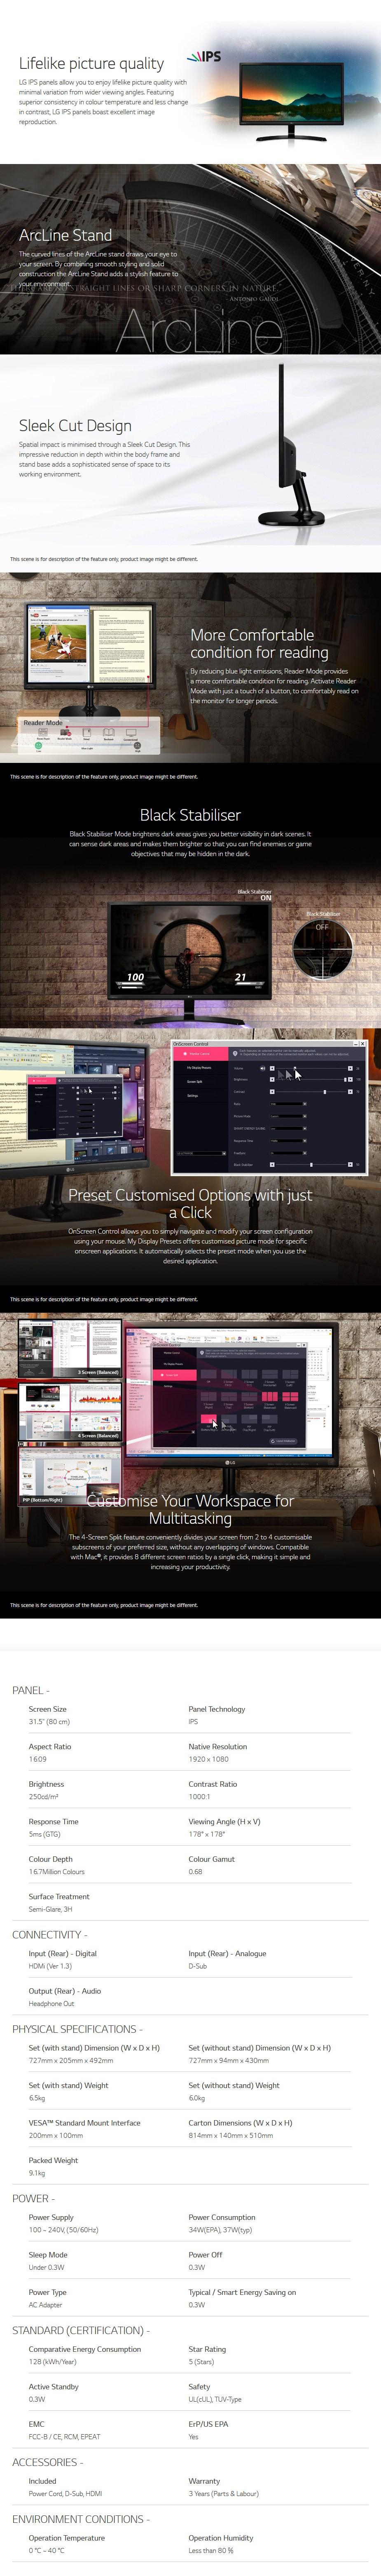 "LG 32MP58HQ 31.5"" Full HD IPS LED Monitor - Desktop Overview 1"